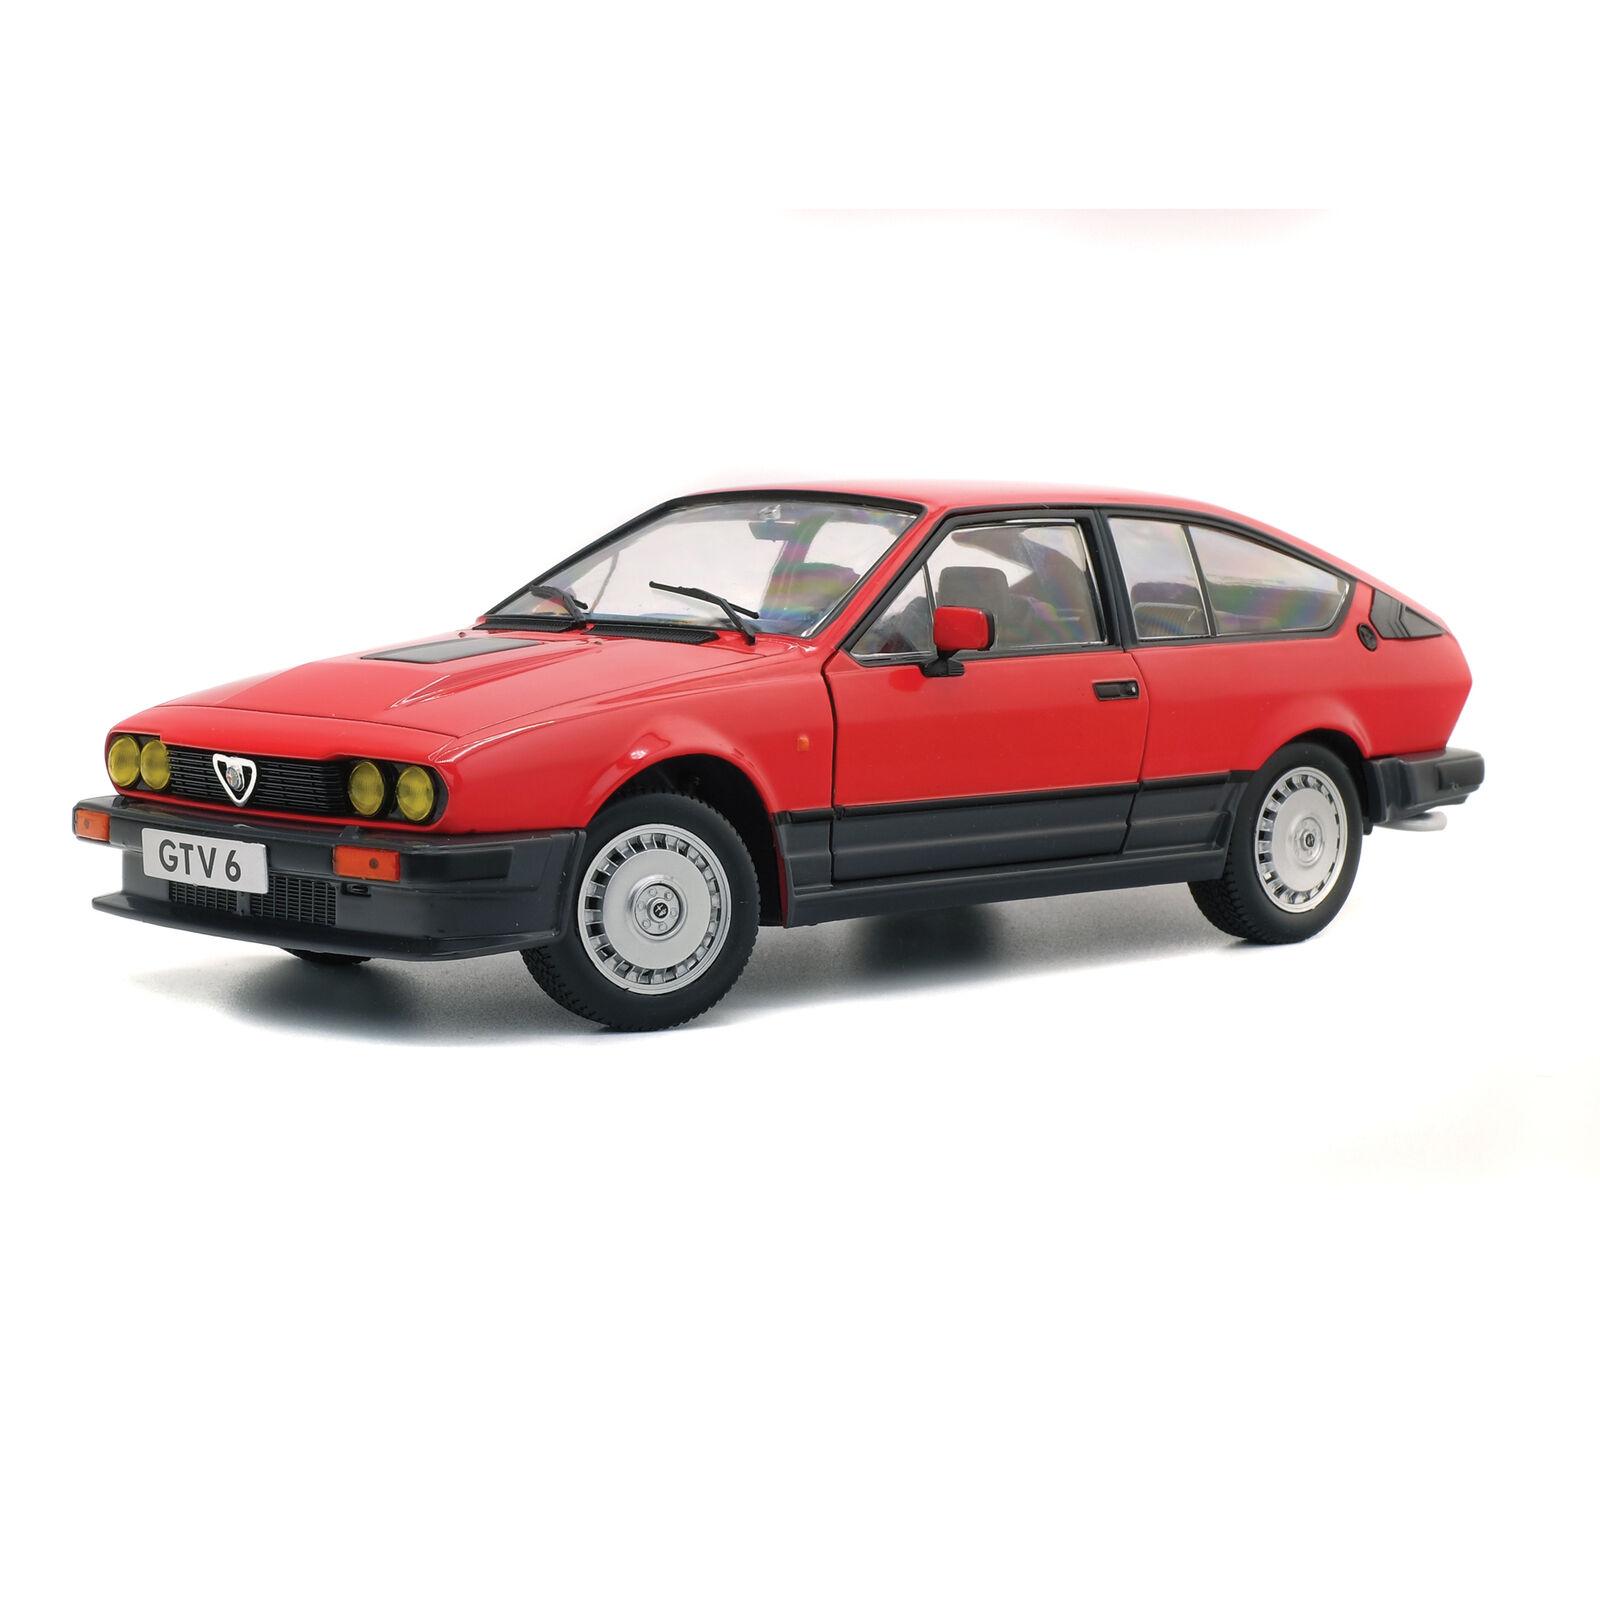 1984 Alfa Romeo GTV 6